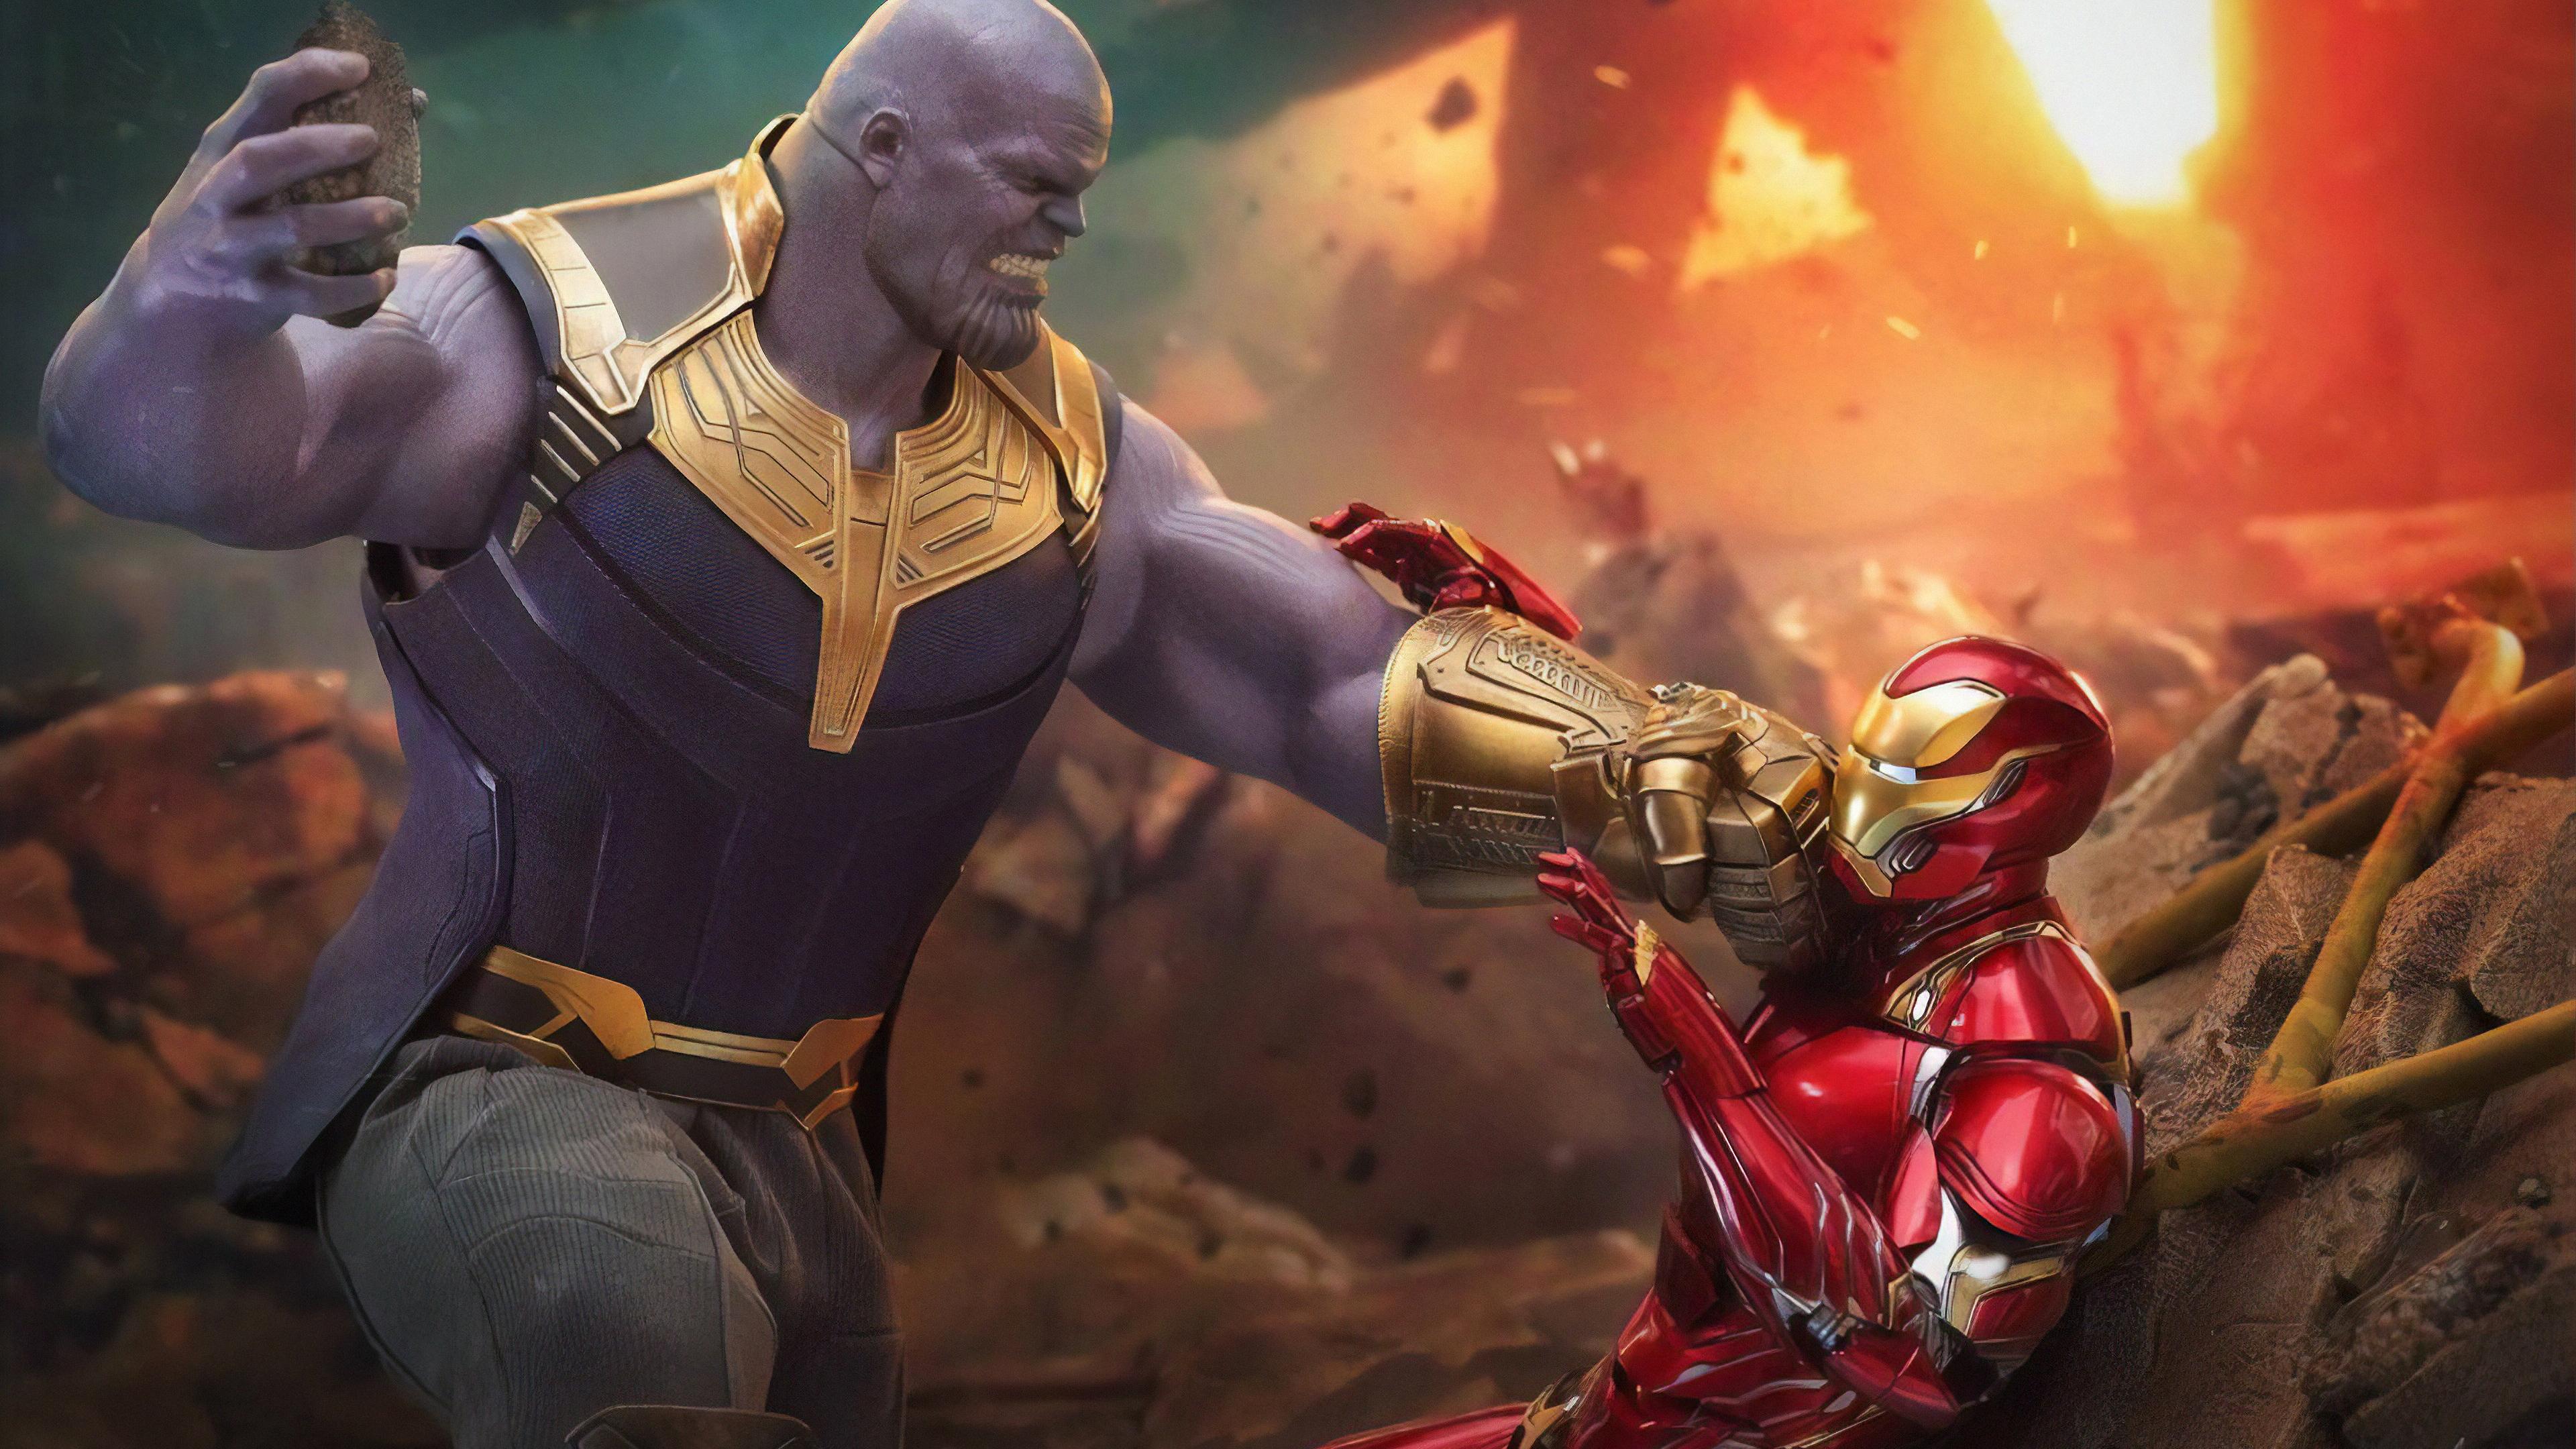 iron man vs thanos 1565053697 - Iron Man Vs Thanos - thanos-wallpapers, superheroes wallpapers, iron man wallpapers, hd-wallpapers, 4k-wallpapers